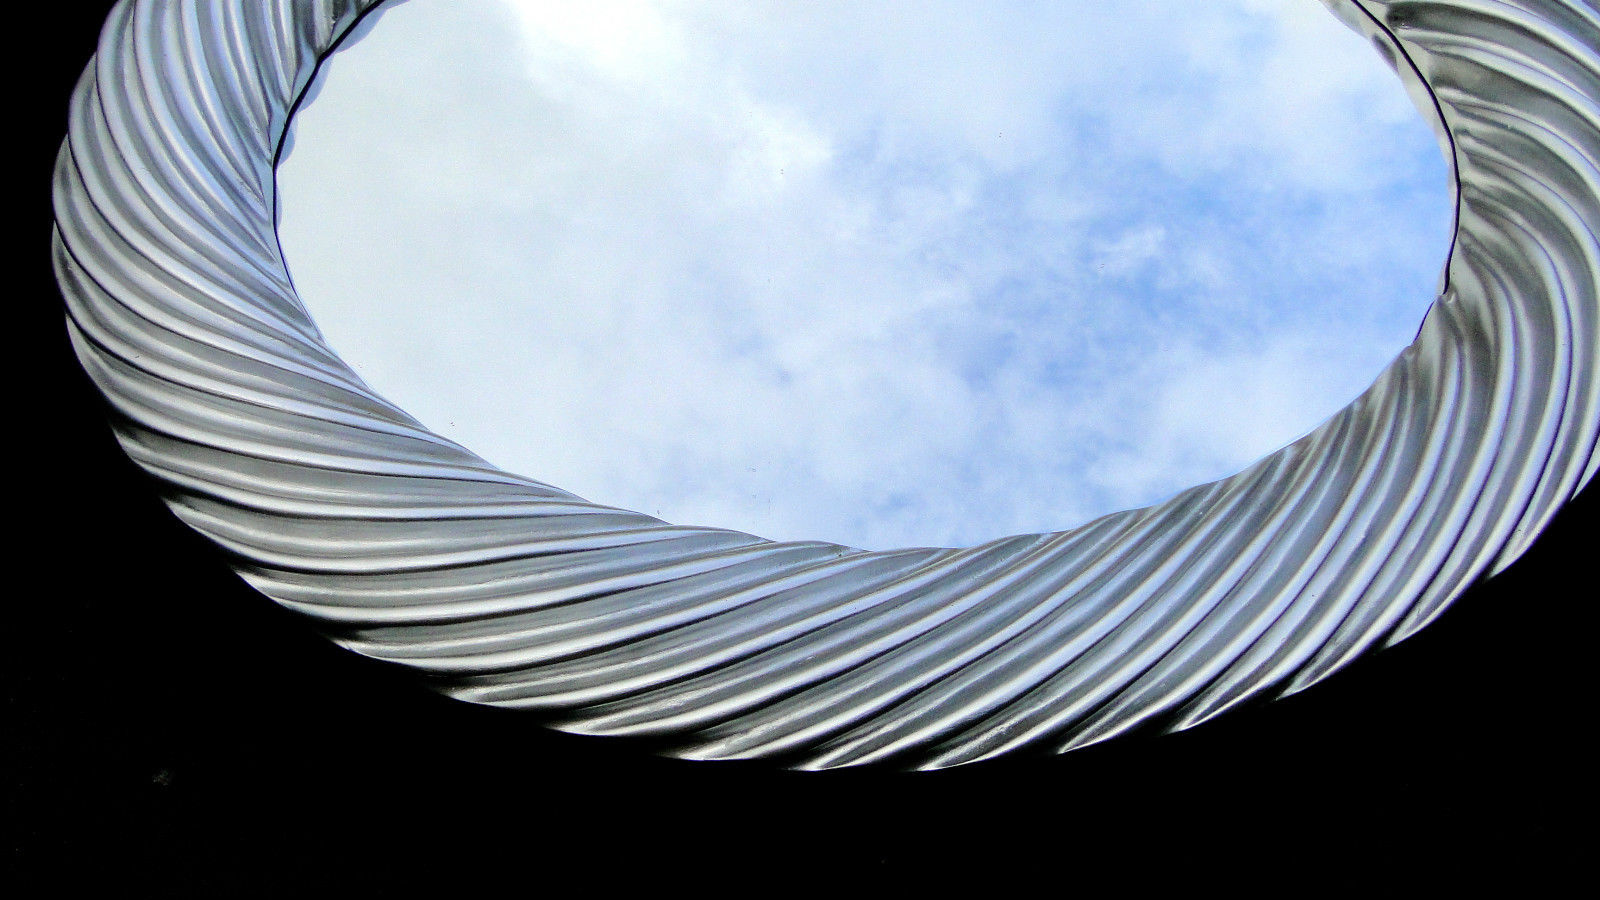 Wandspiegel Silber Oval Groß Xxl 110x 85 Flurspiegel Friseur ...